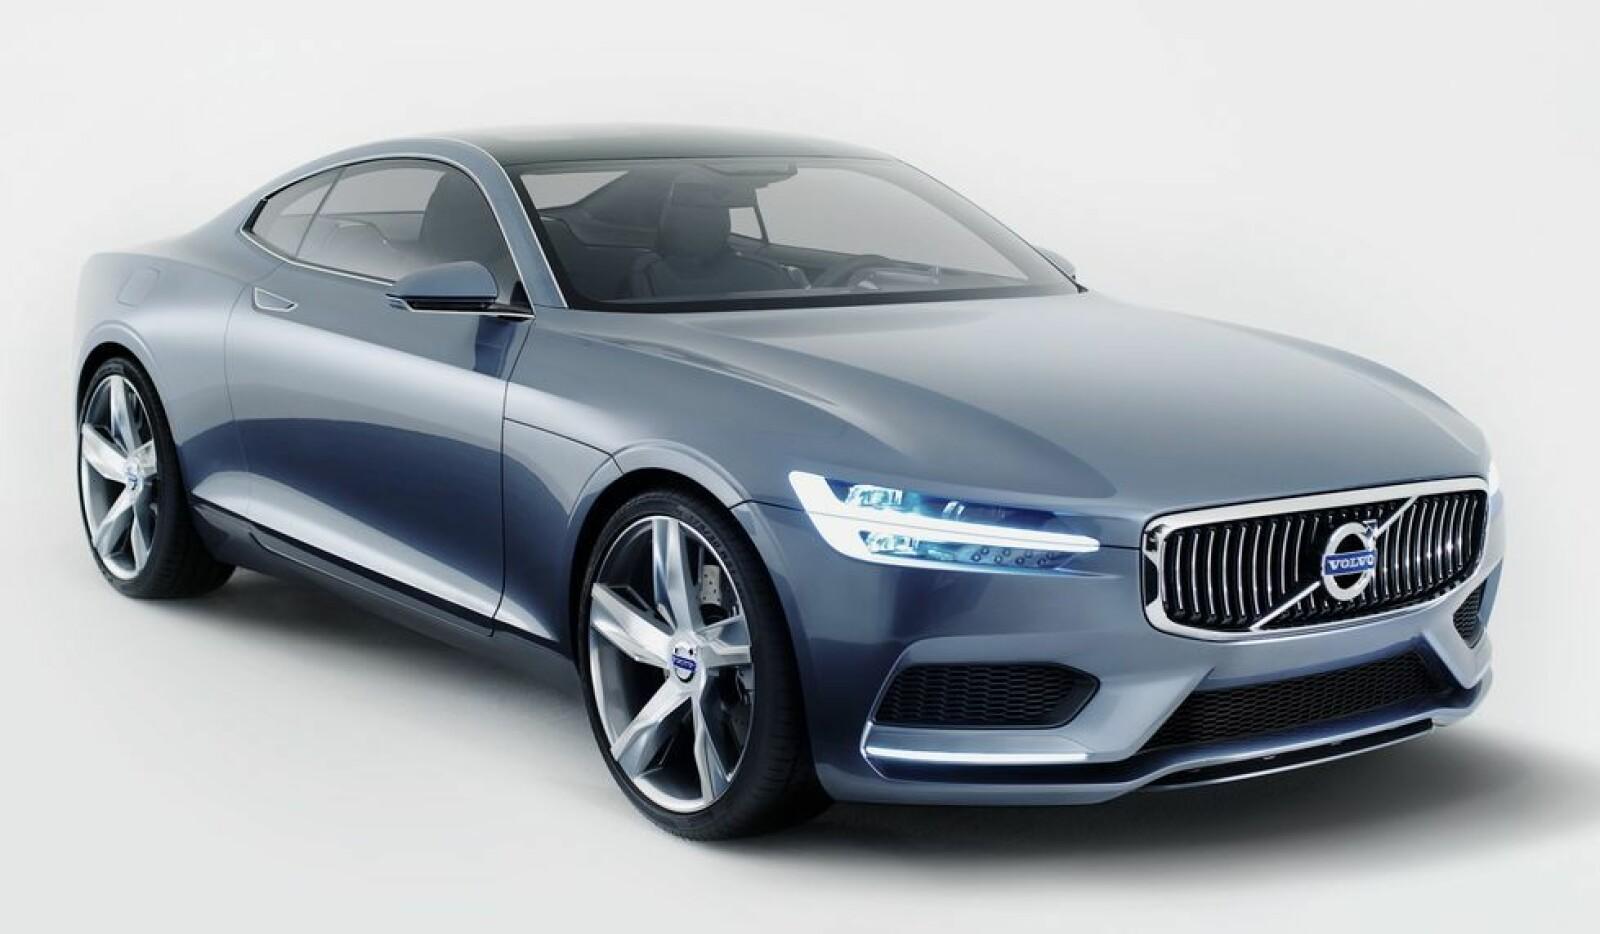 <b><SPAN CLASS=BOLD><STRONG>POLESTAR:</b></strong></span> Volvos svar til alle som ønsket en sportslig og moderne P1800 var Volvo Concept Coupé.